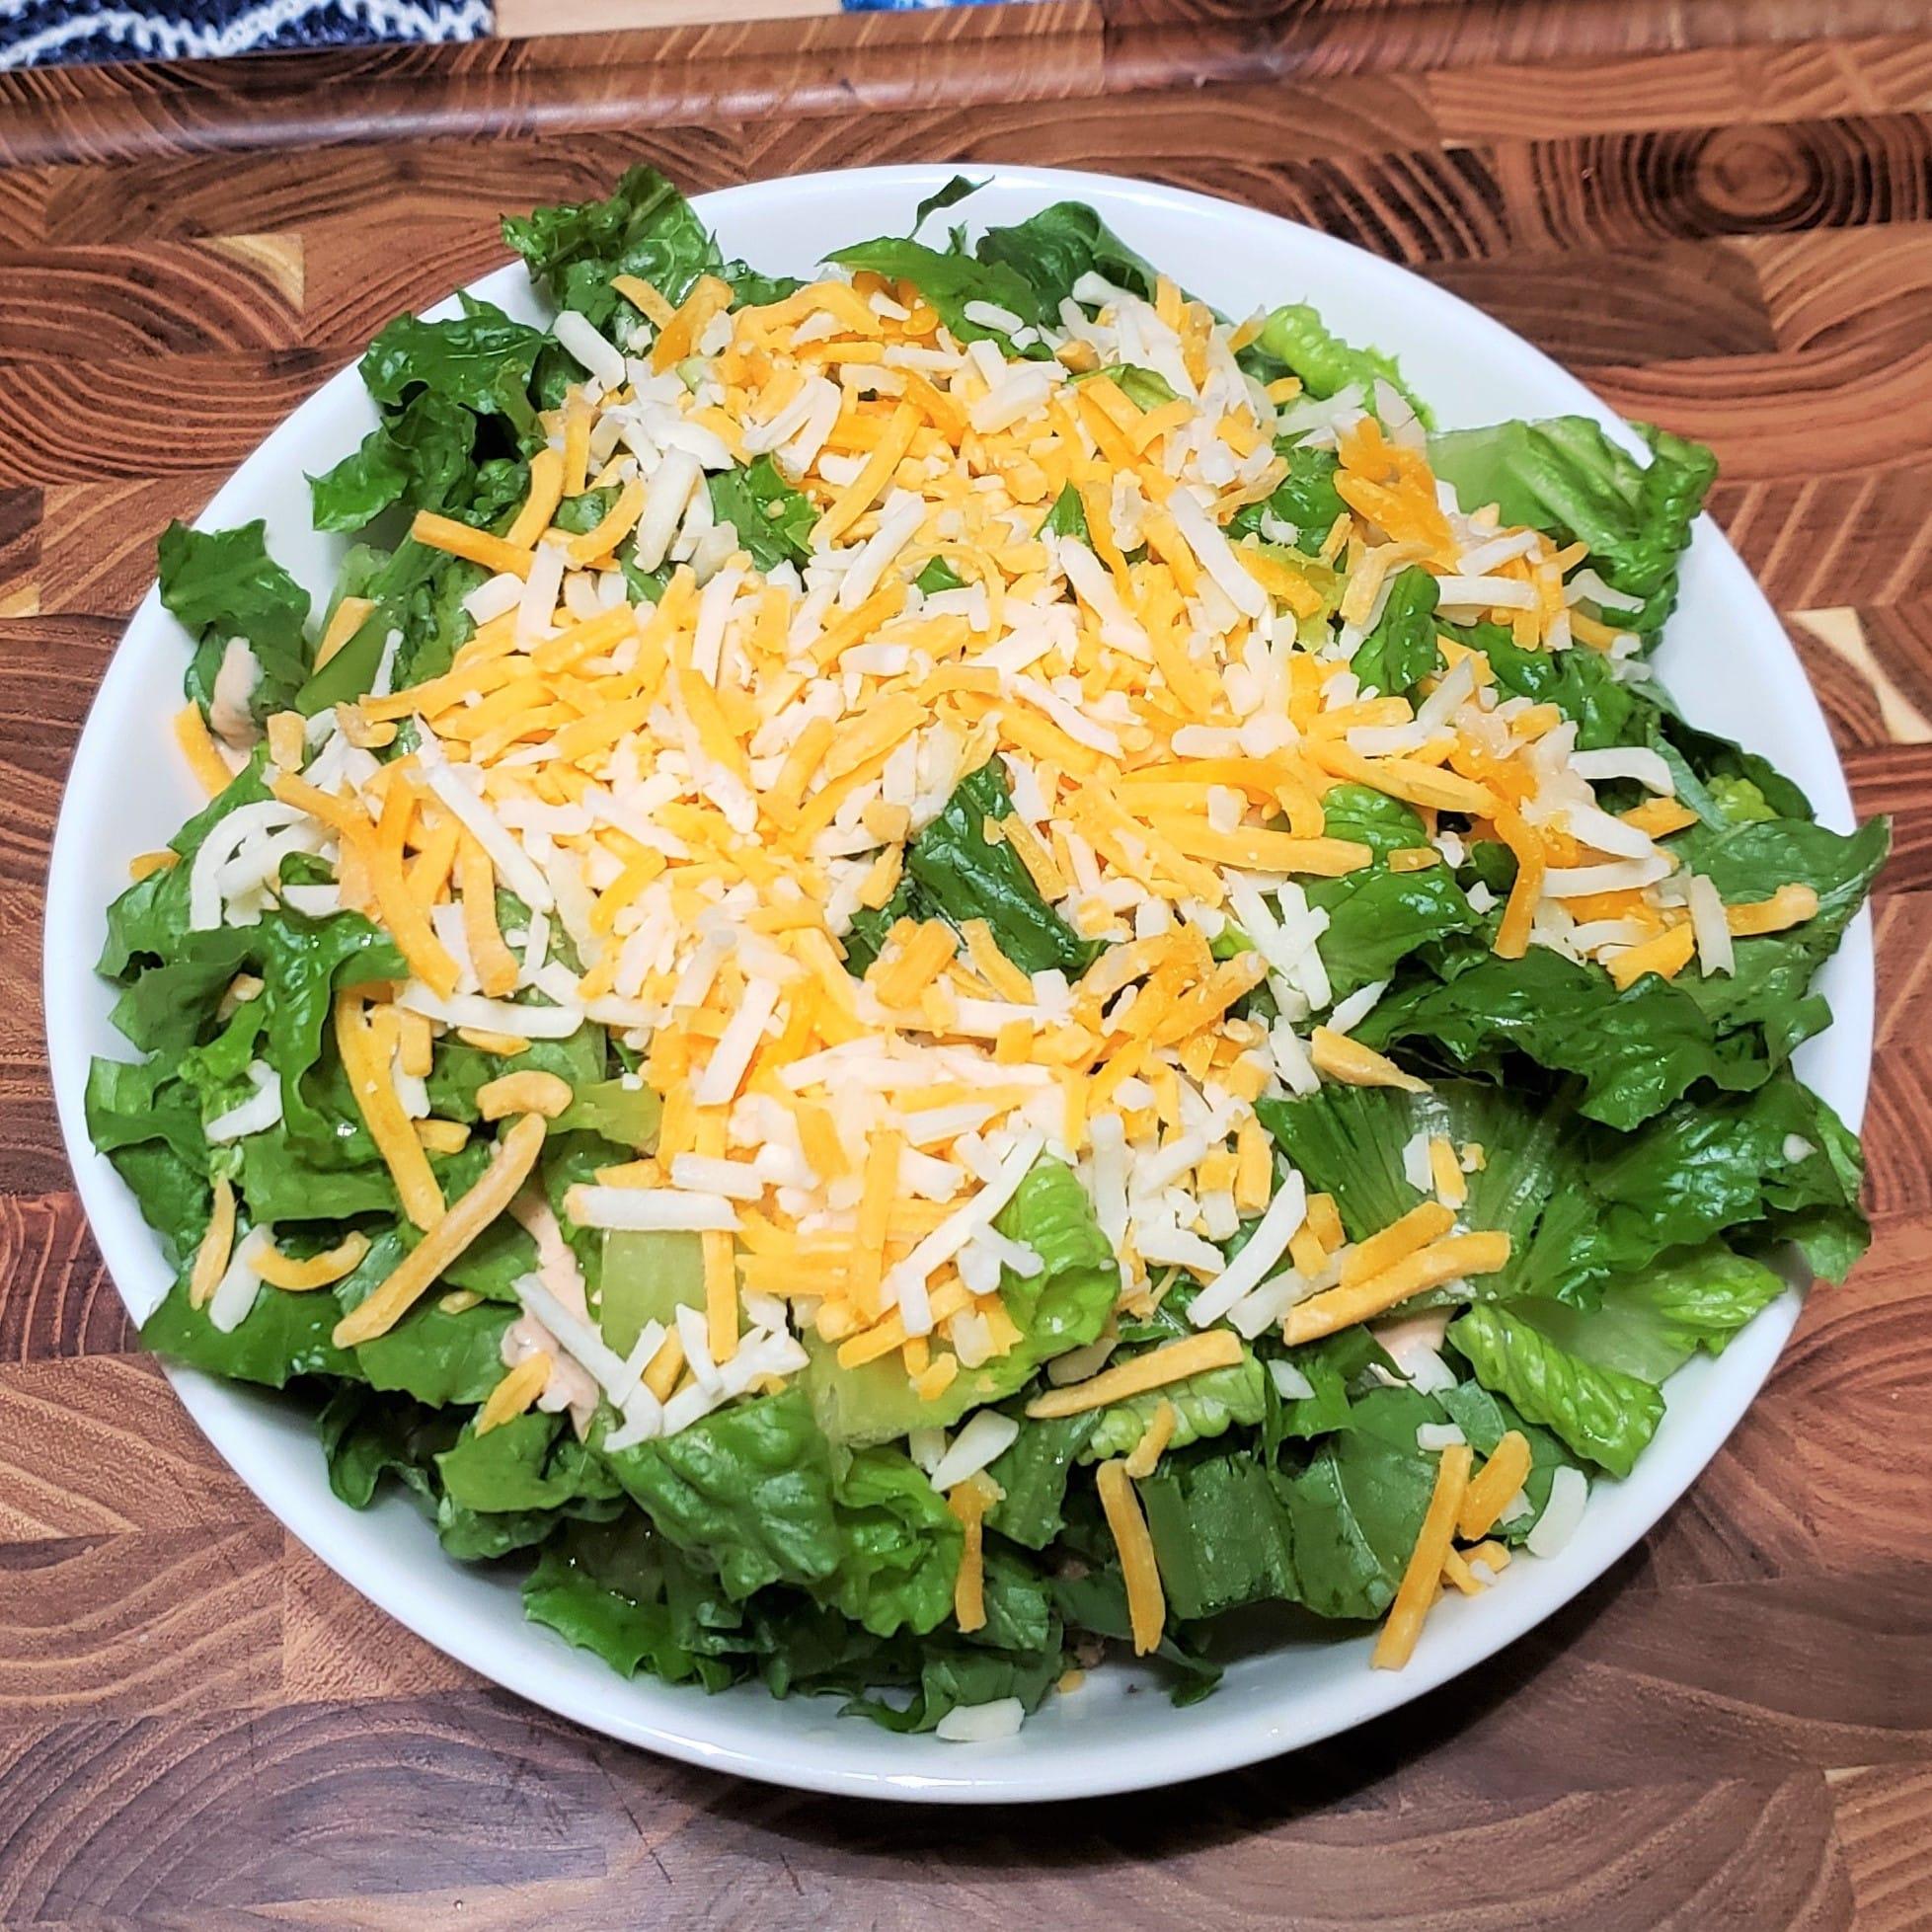 Add Shredded Cheese on Top oAdd Shredded Cheese on Top of Lettuce for Big Mac Salad